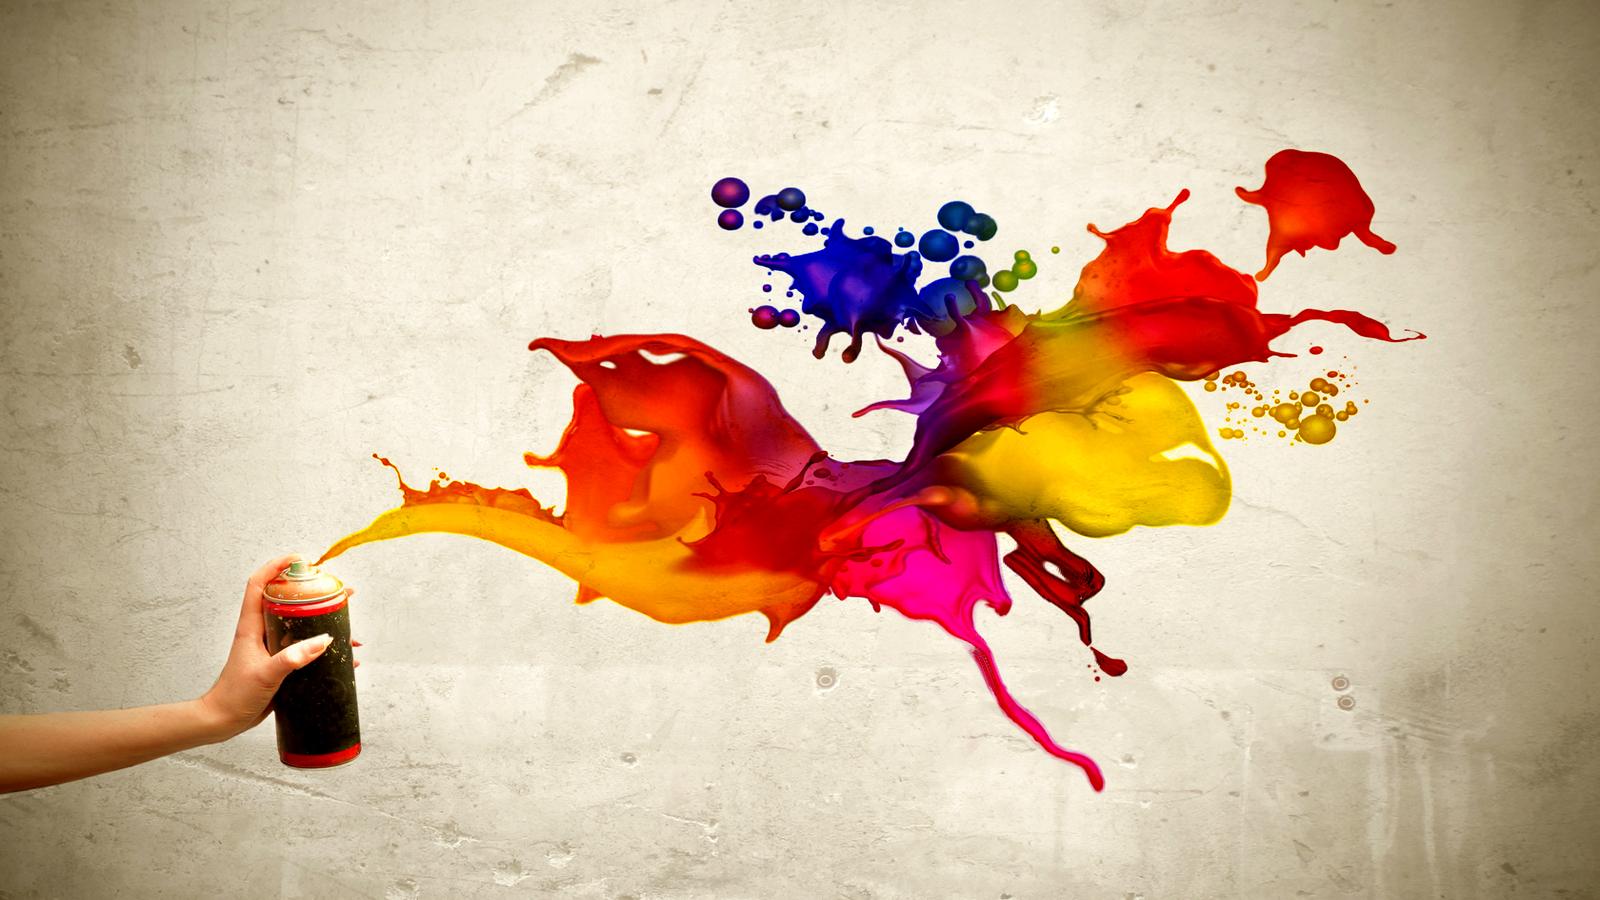 Latest Hd Wallpapers For Desktop Free Download Vinnyoleo